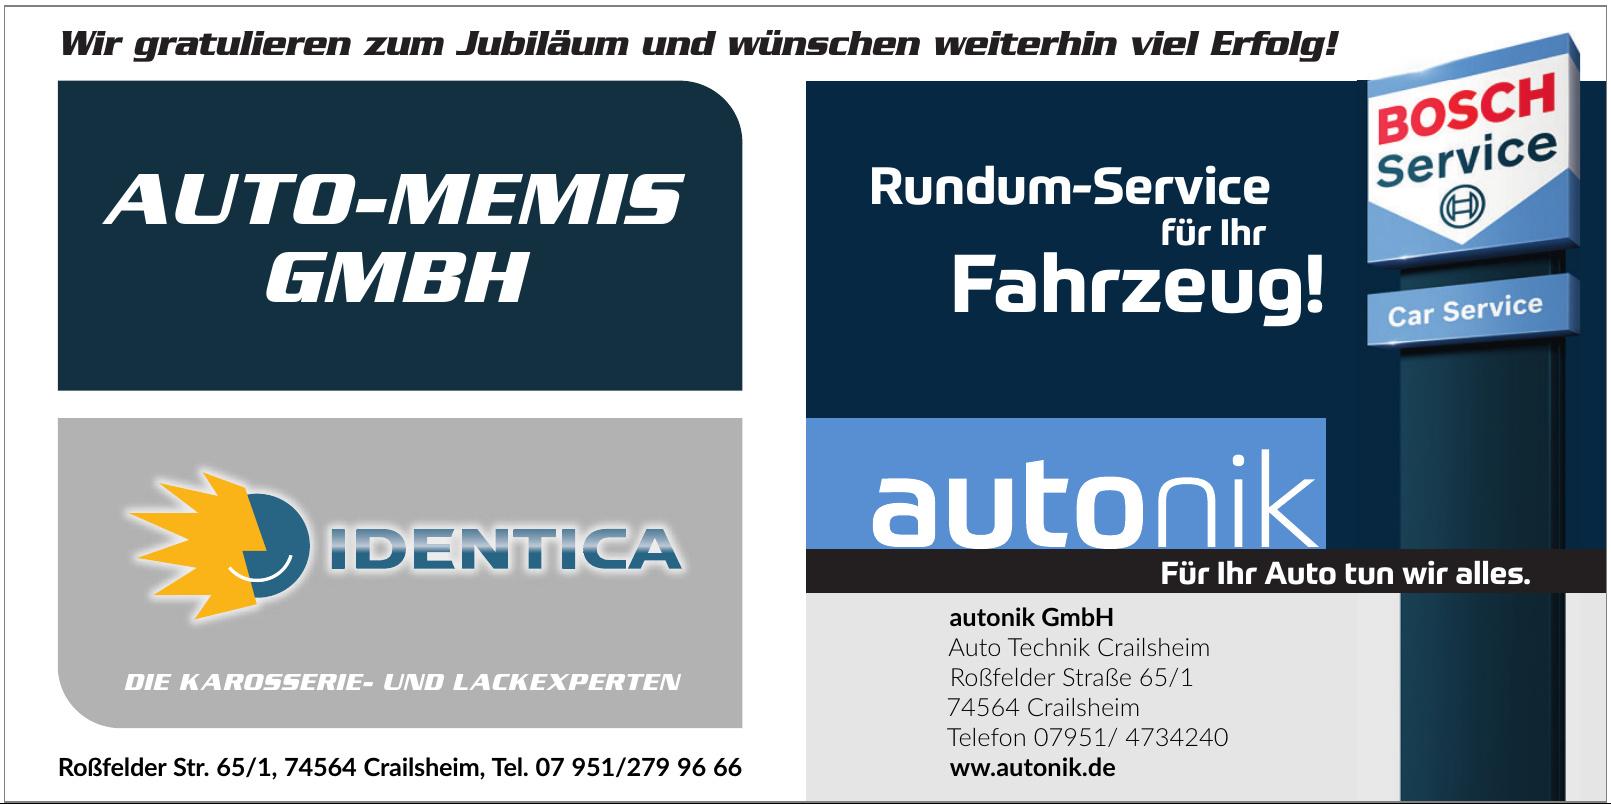 autonik GmbH Auto Technik Crailsheim